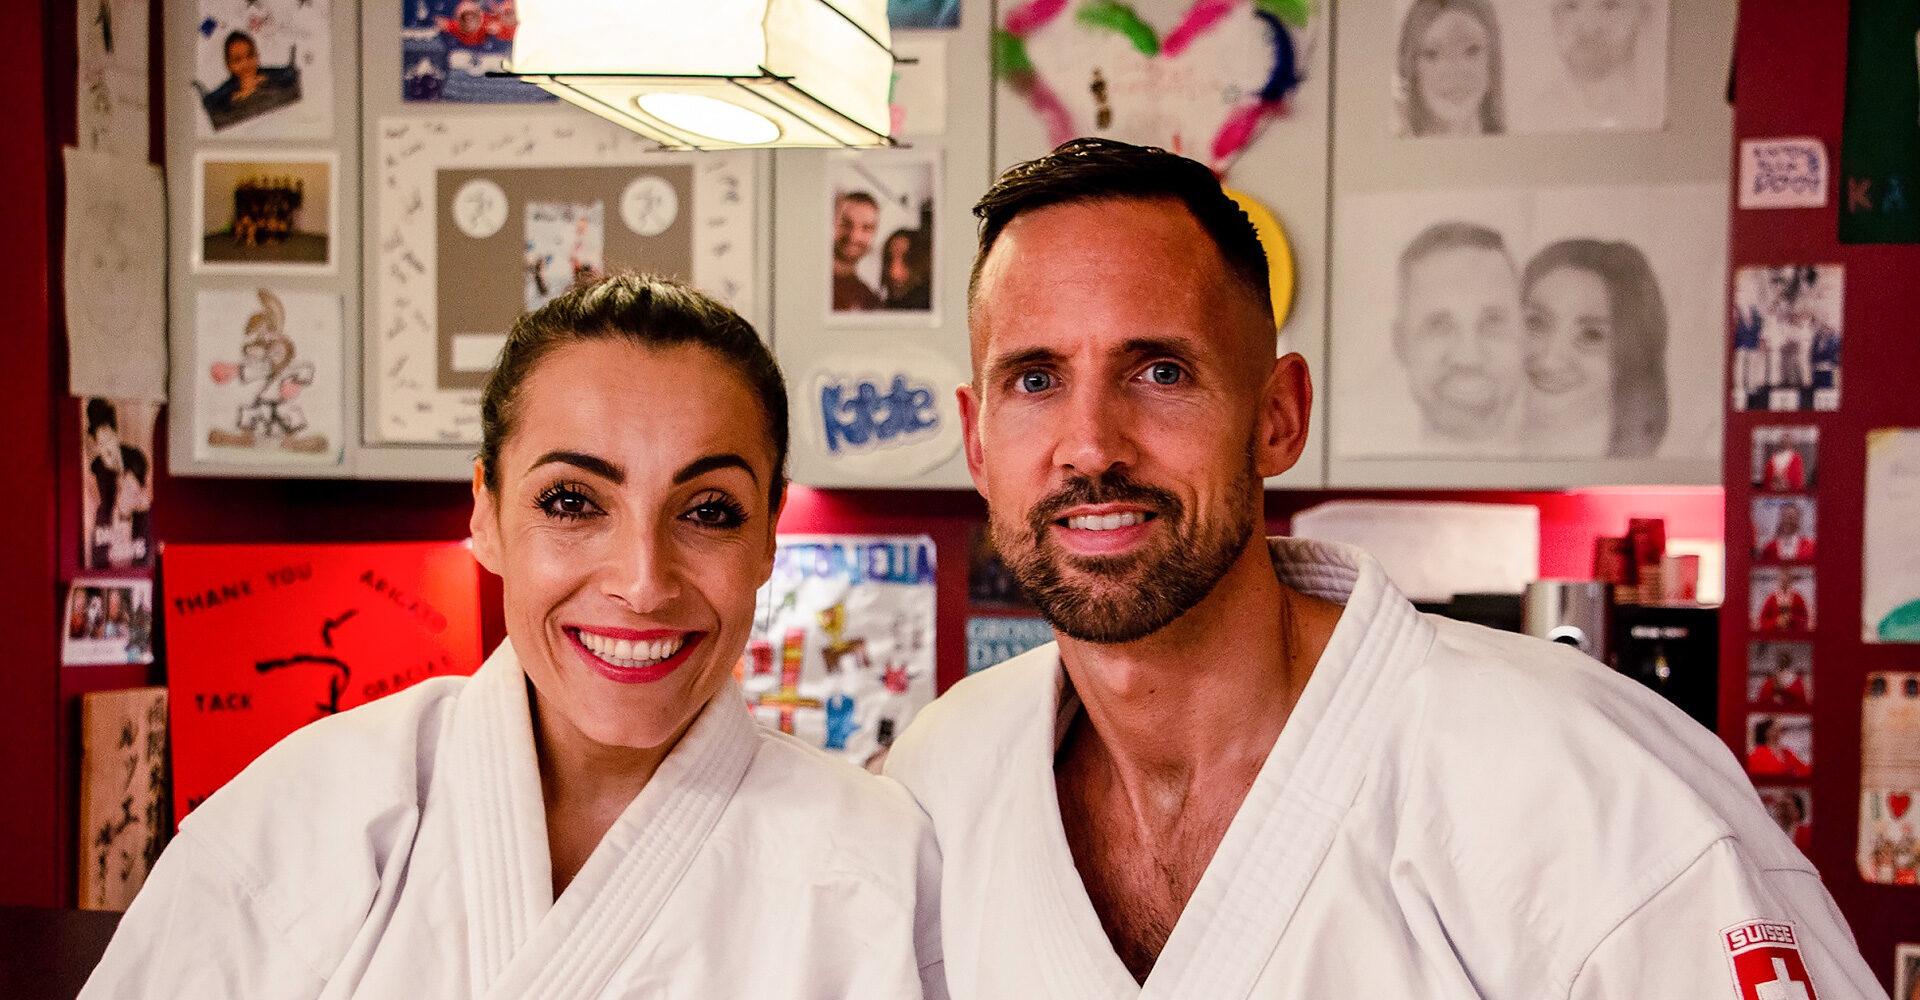 Karateschule Kimura Shukokai Luzern #1